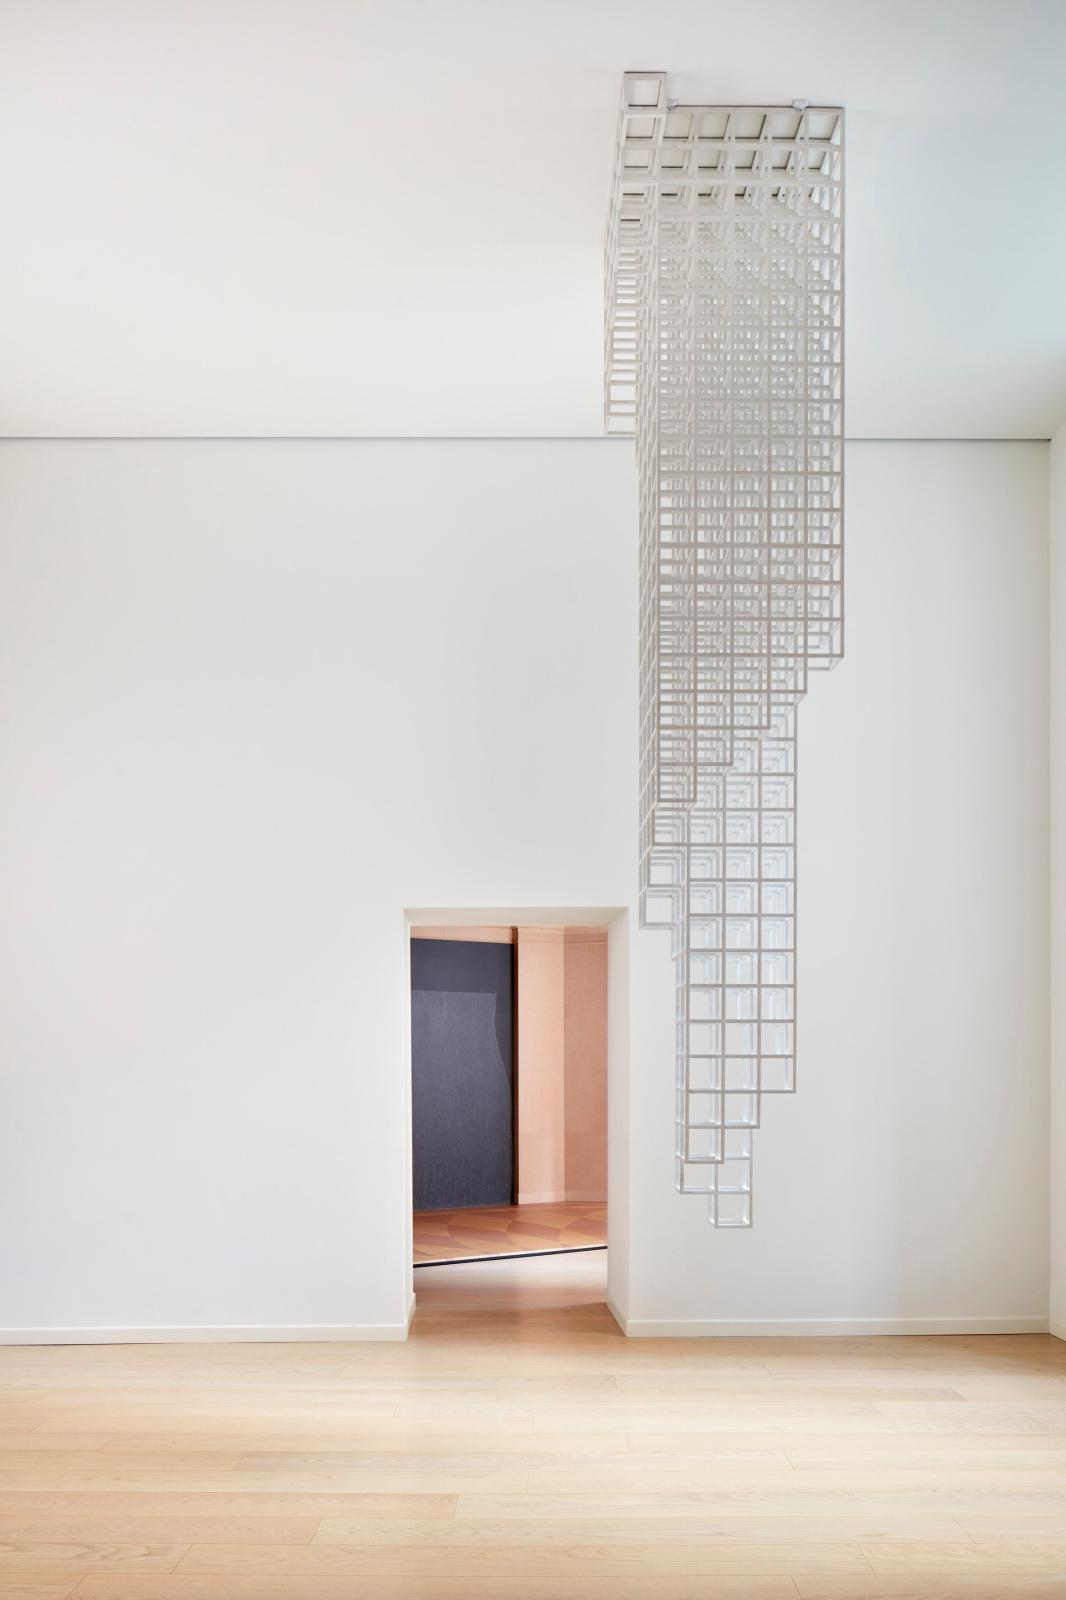 Sol LeWitt, Inverted Spiraling Tower, 1988, structure en bois peint en blanc.